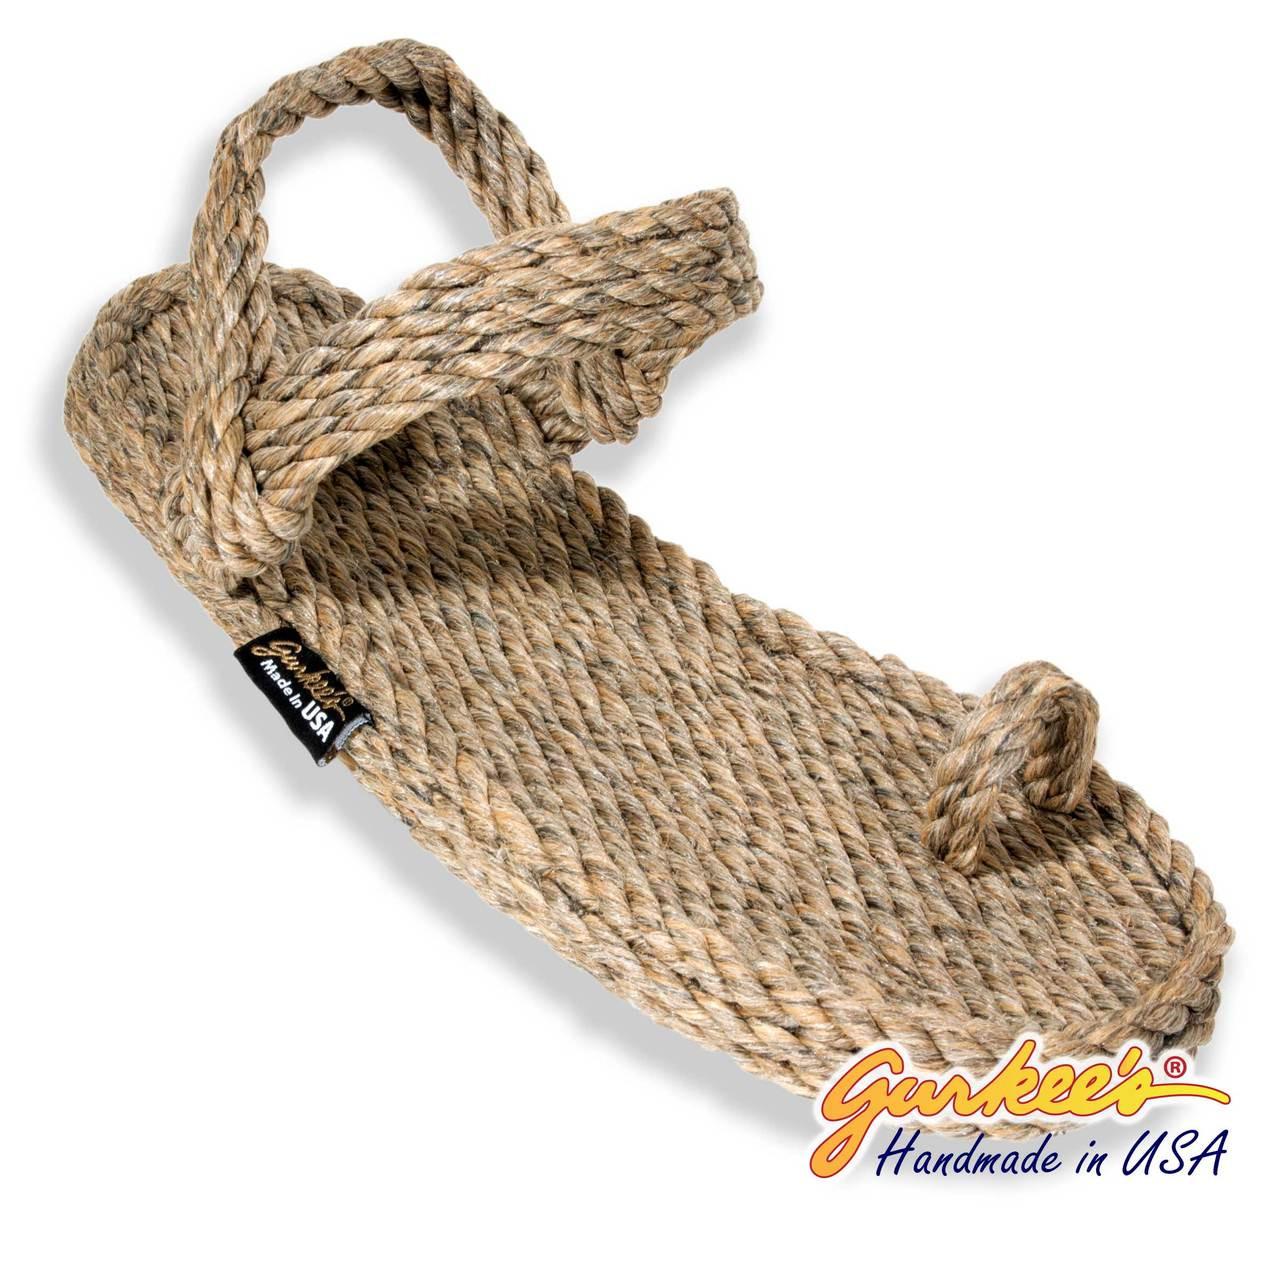 63399f4a18f1 Signature Kona Hemp Color Rope Sandals - Gurkee s